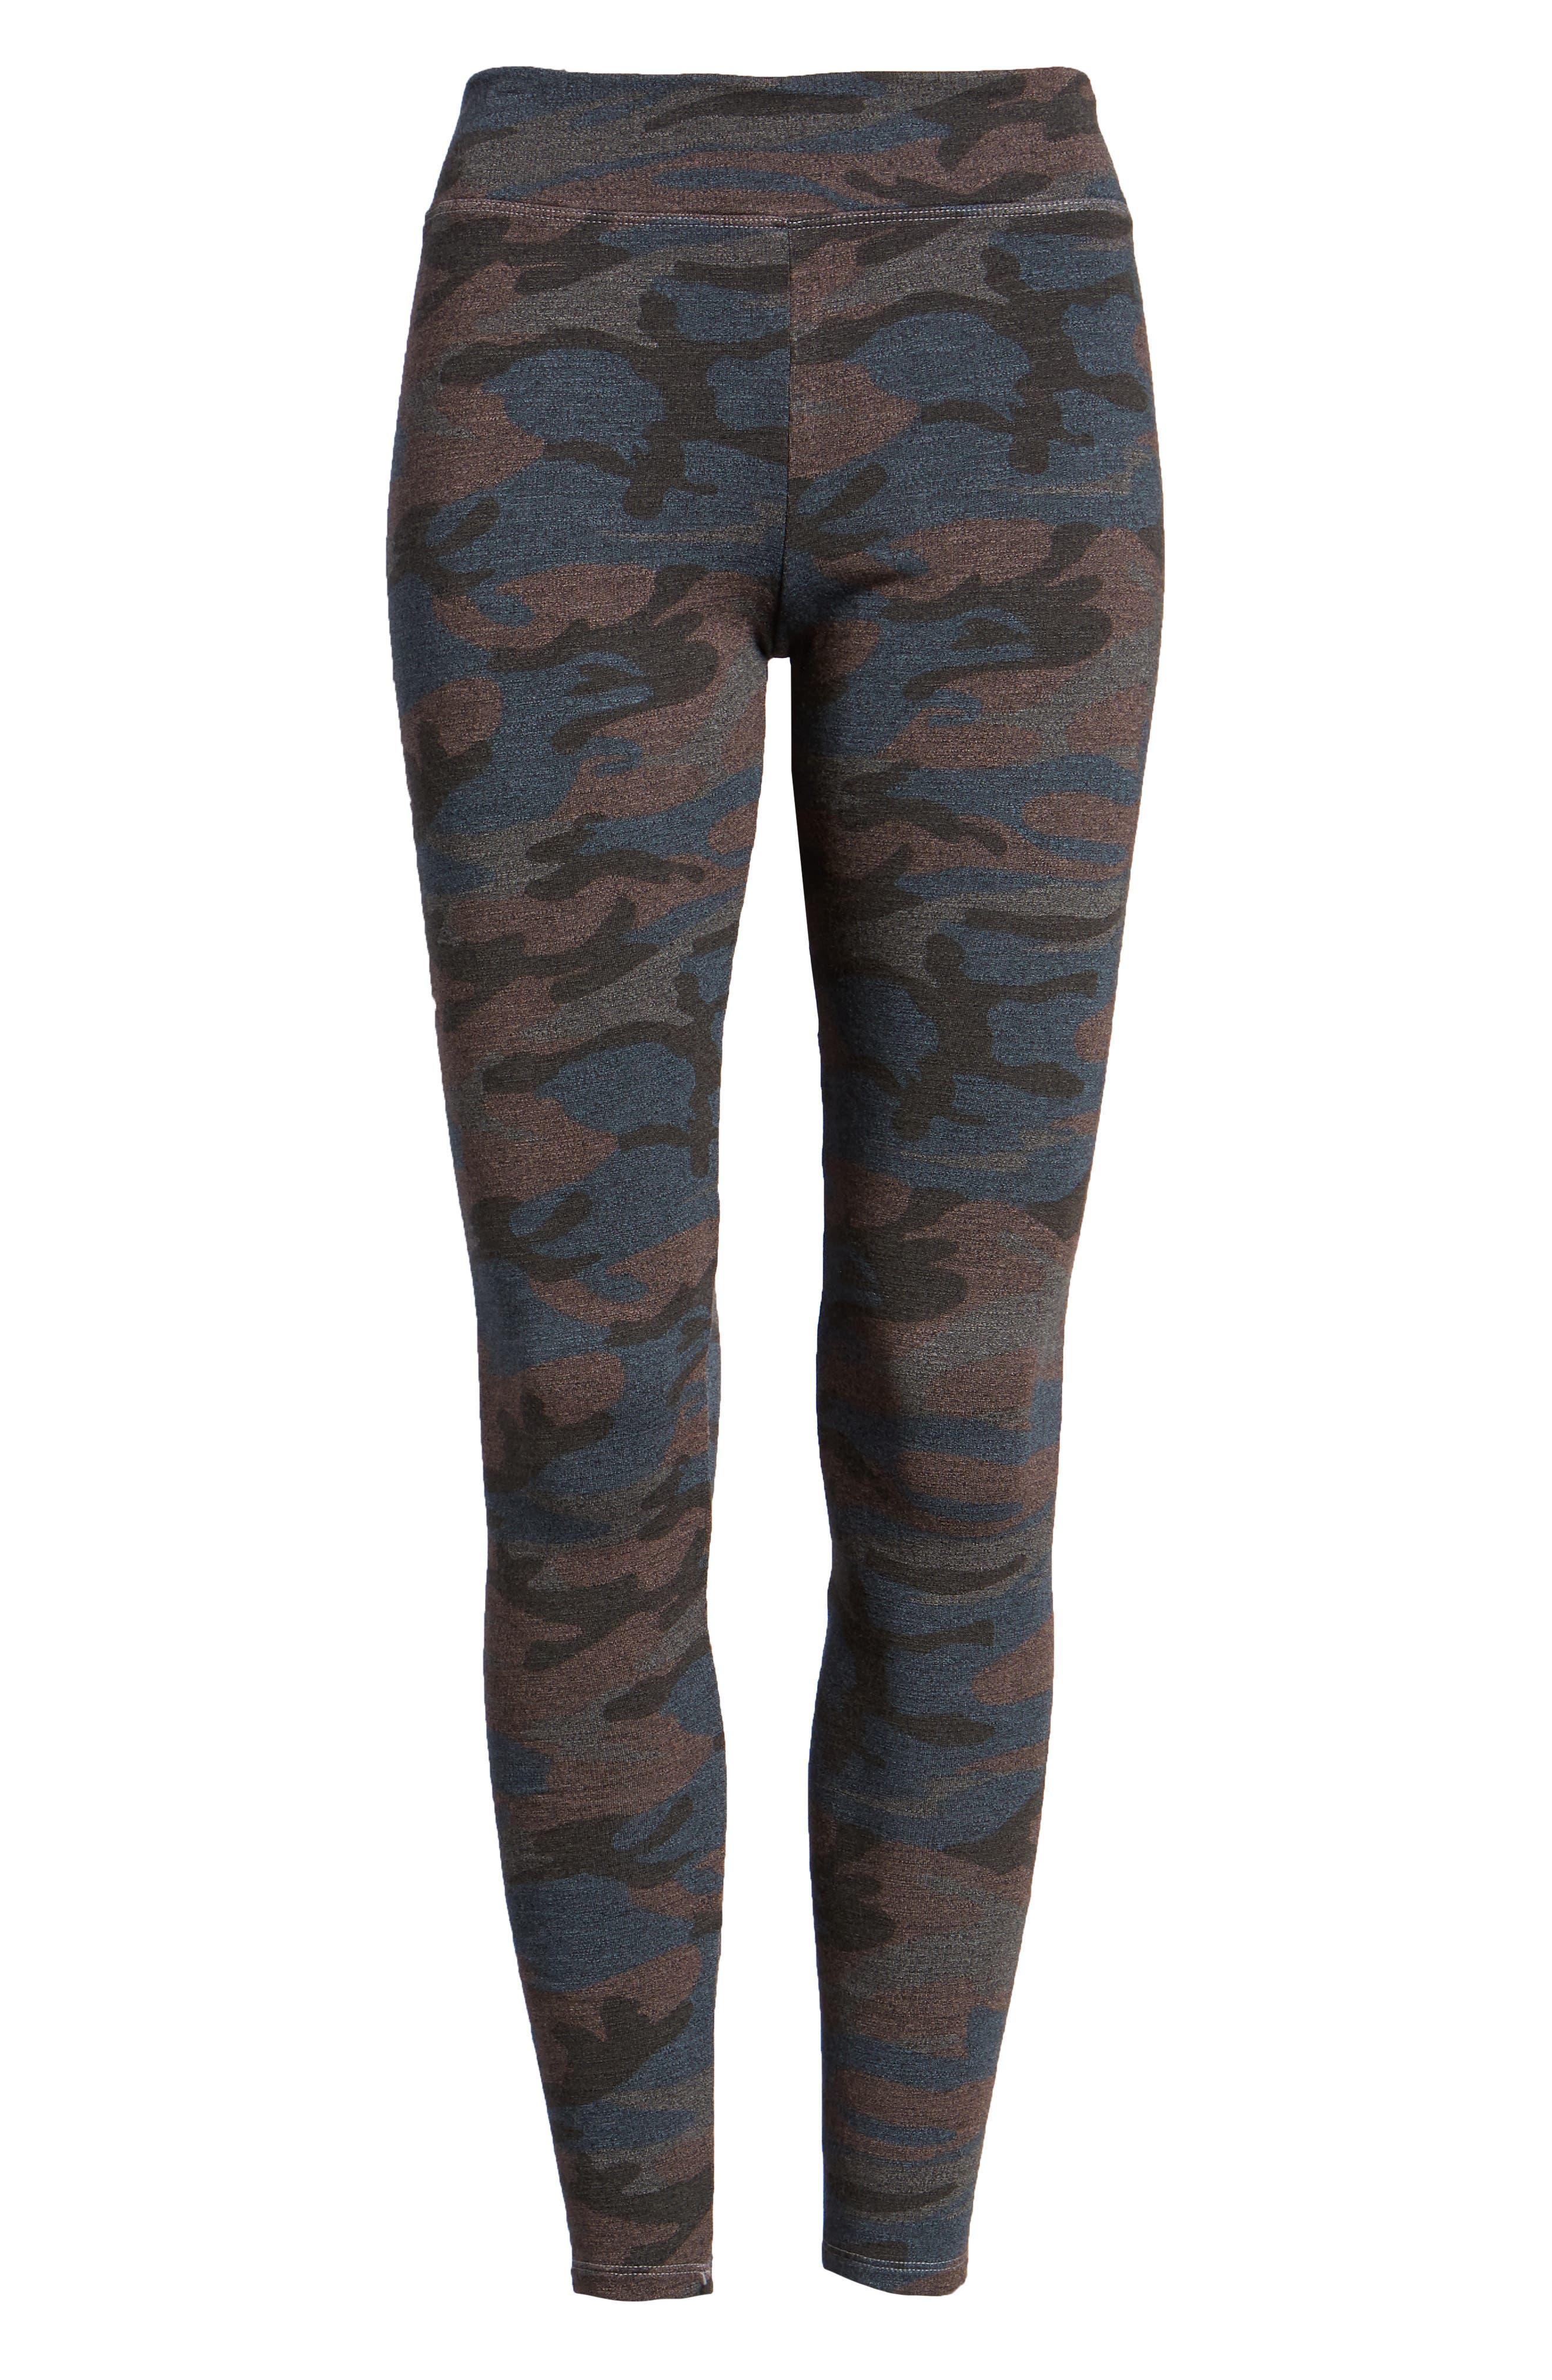 SUNDRY,                             Camo Yoga Pants,                             Alternate thumbnail 6, color,                             020